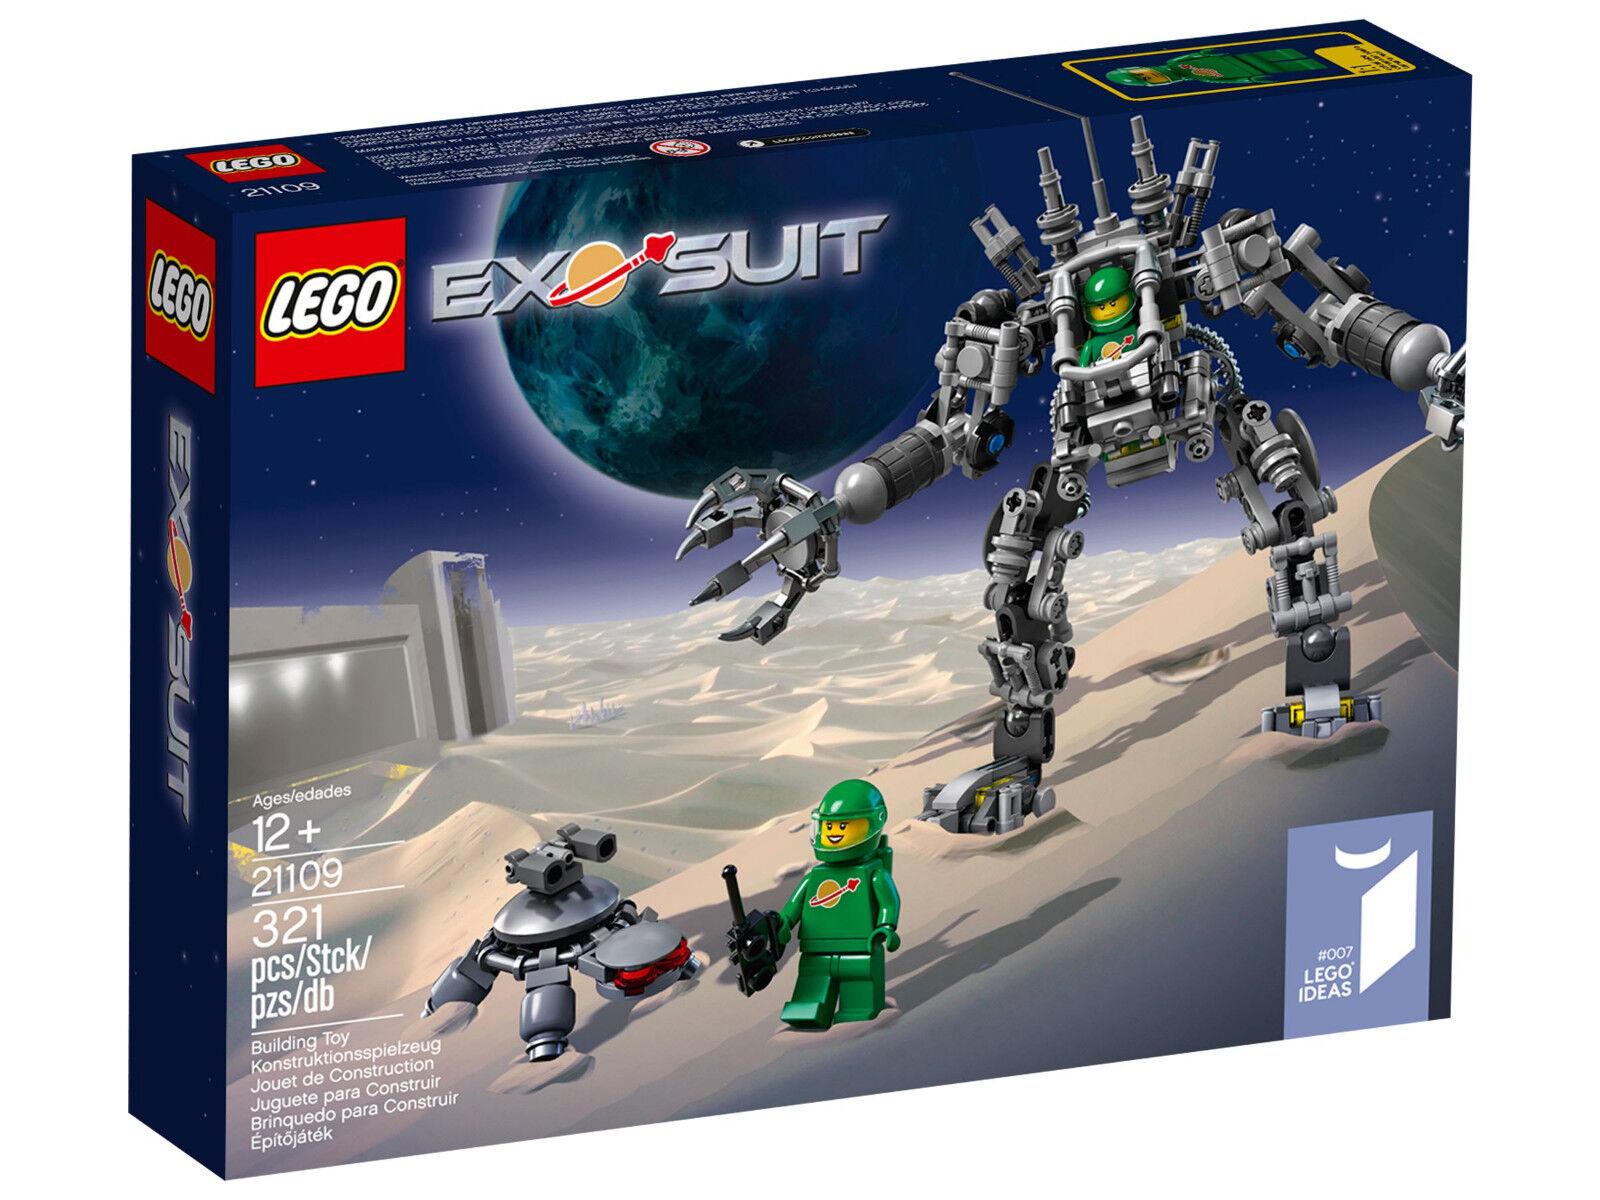 LEGO 21109 EXO Suit - Ideas  Cuusoo Exosuit Robot Pete Yve Weltraum spazio Mech  consegna rapida